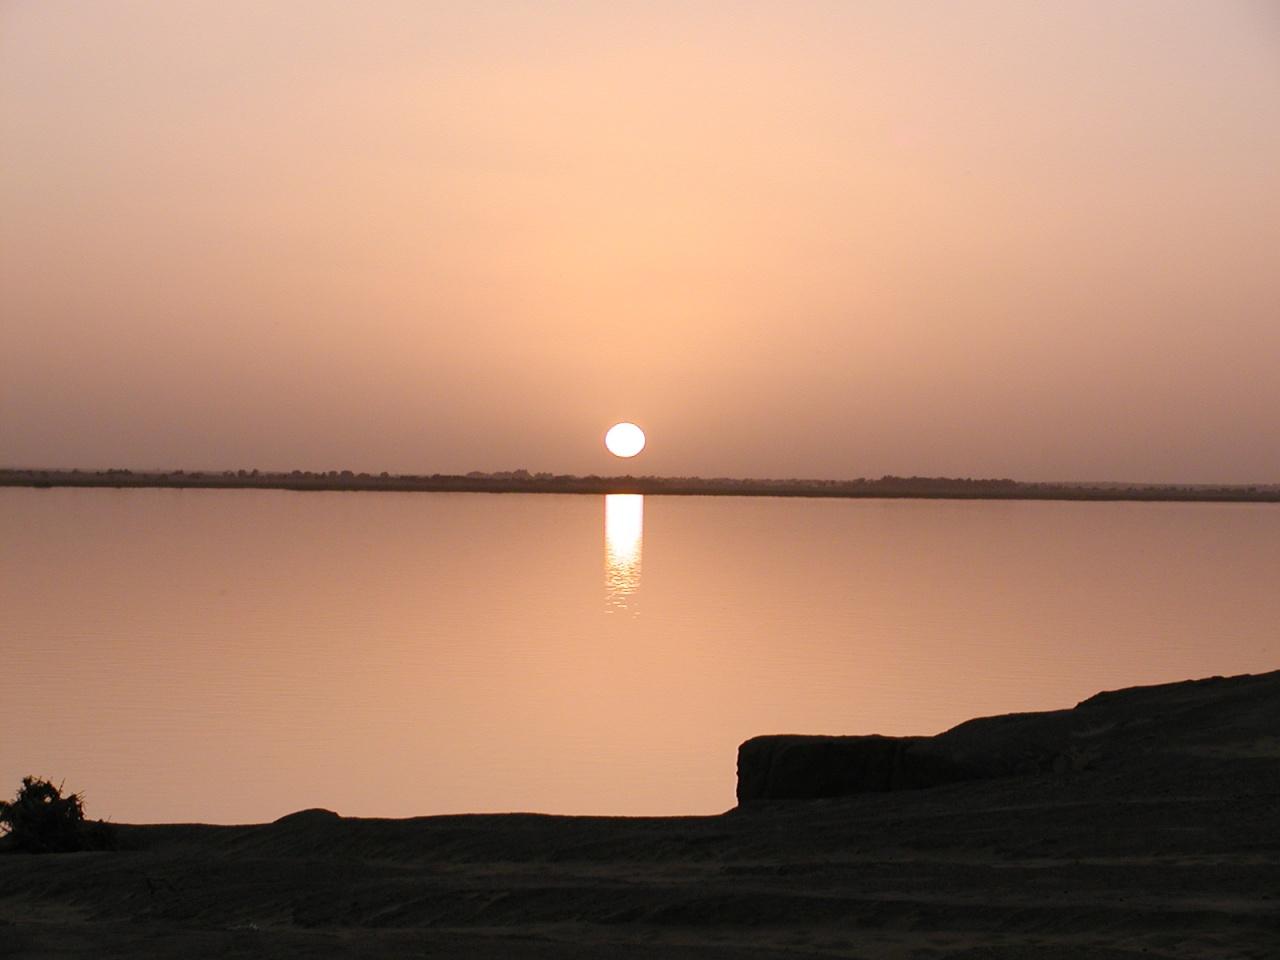 coucher de soleil à Karkadjane